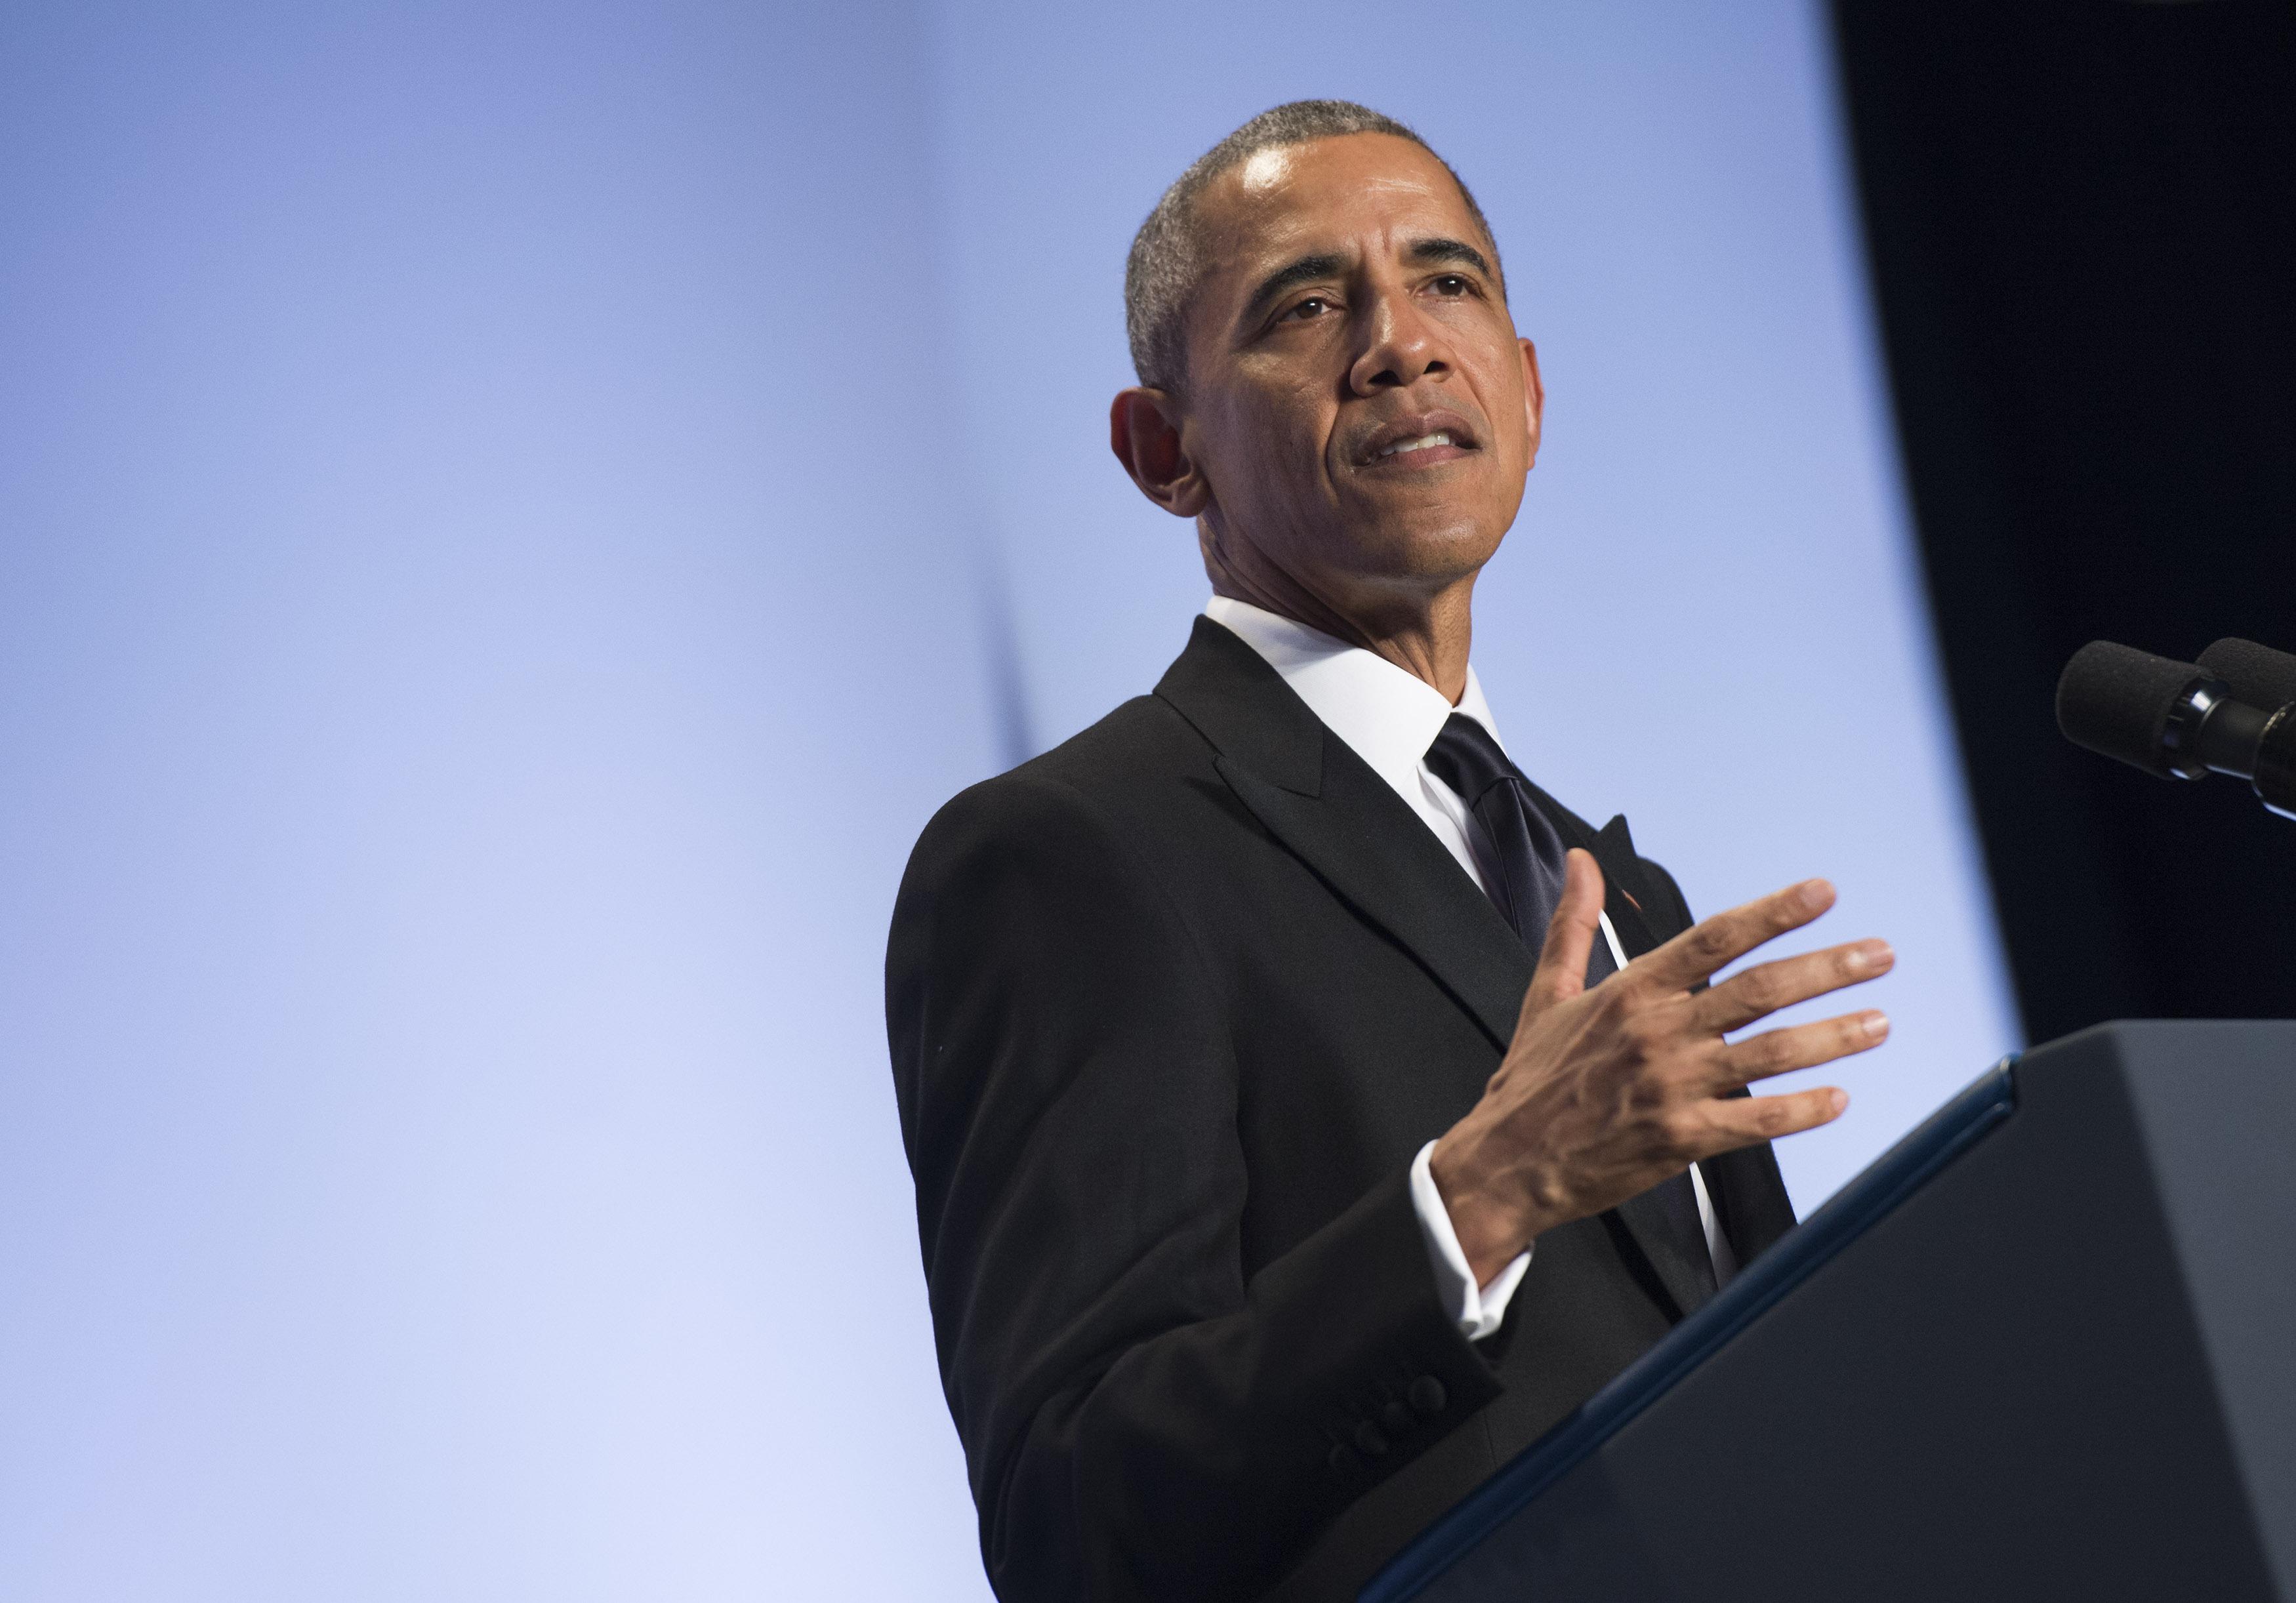 President Obama addresses the APAICS Gala in Washington, D.C.